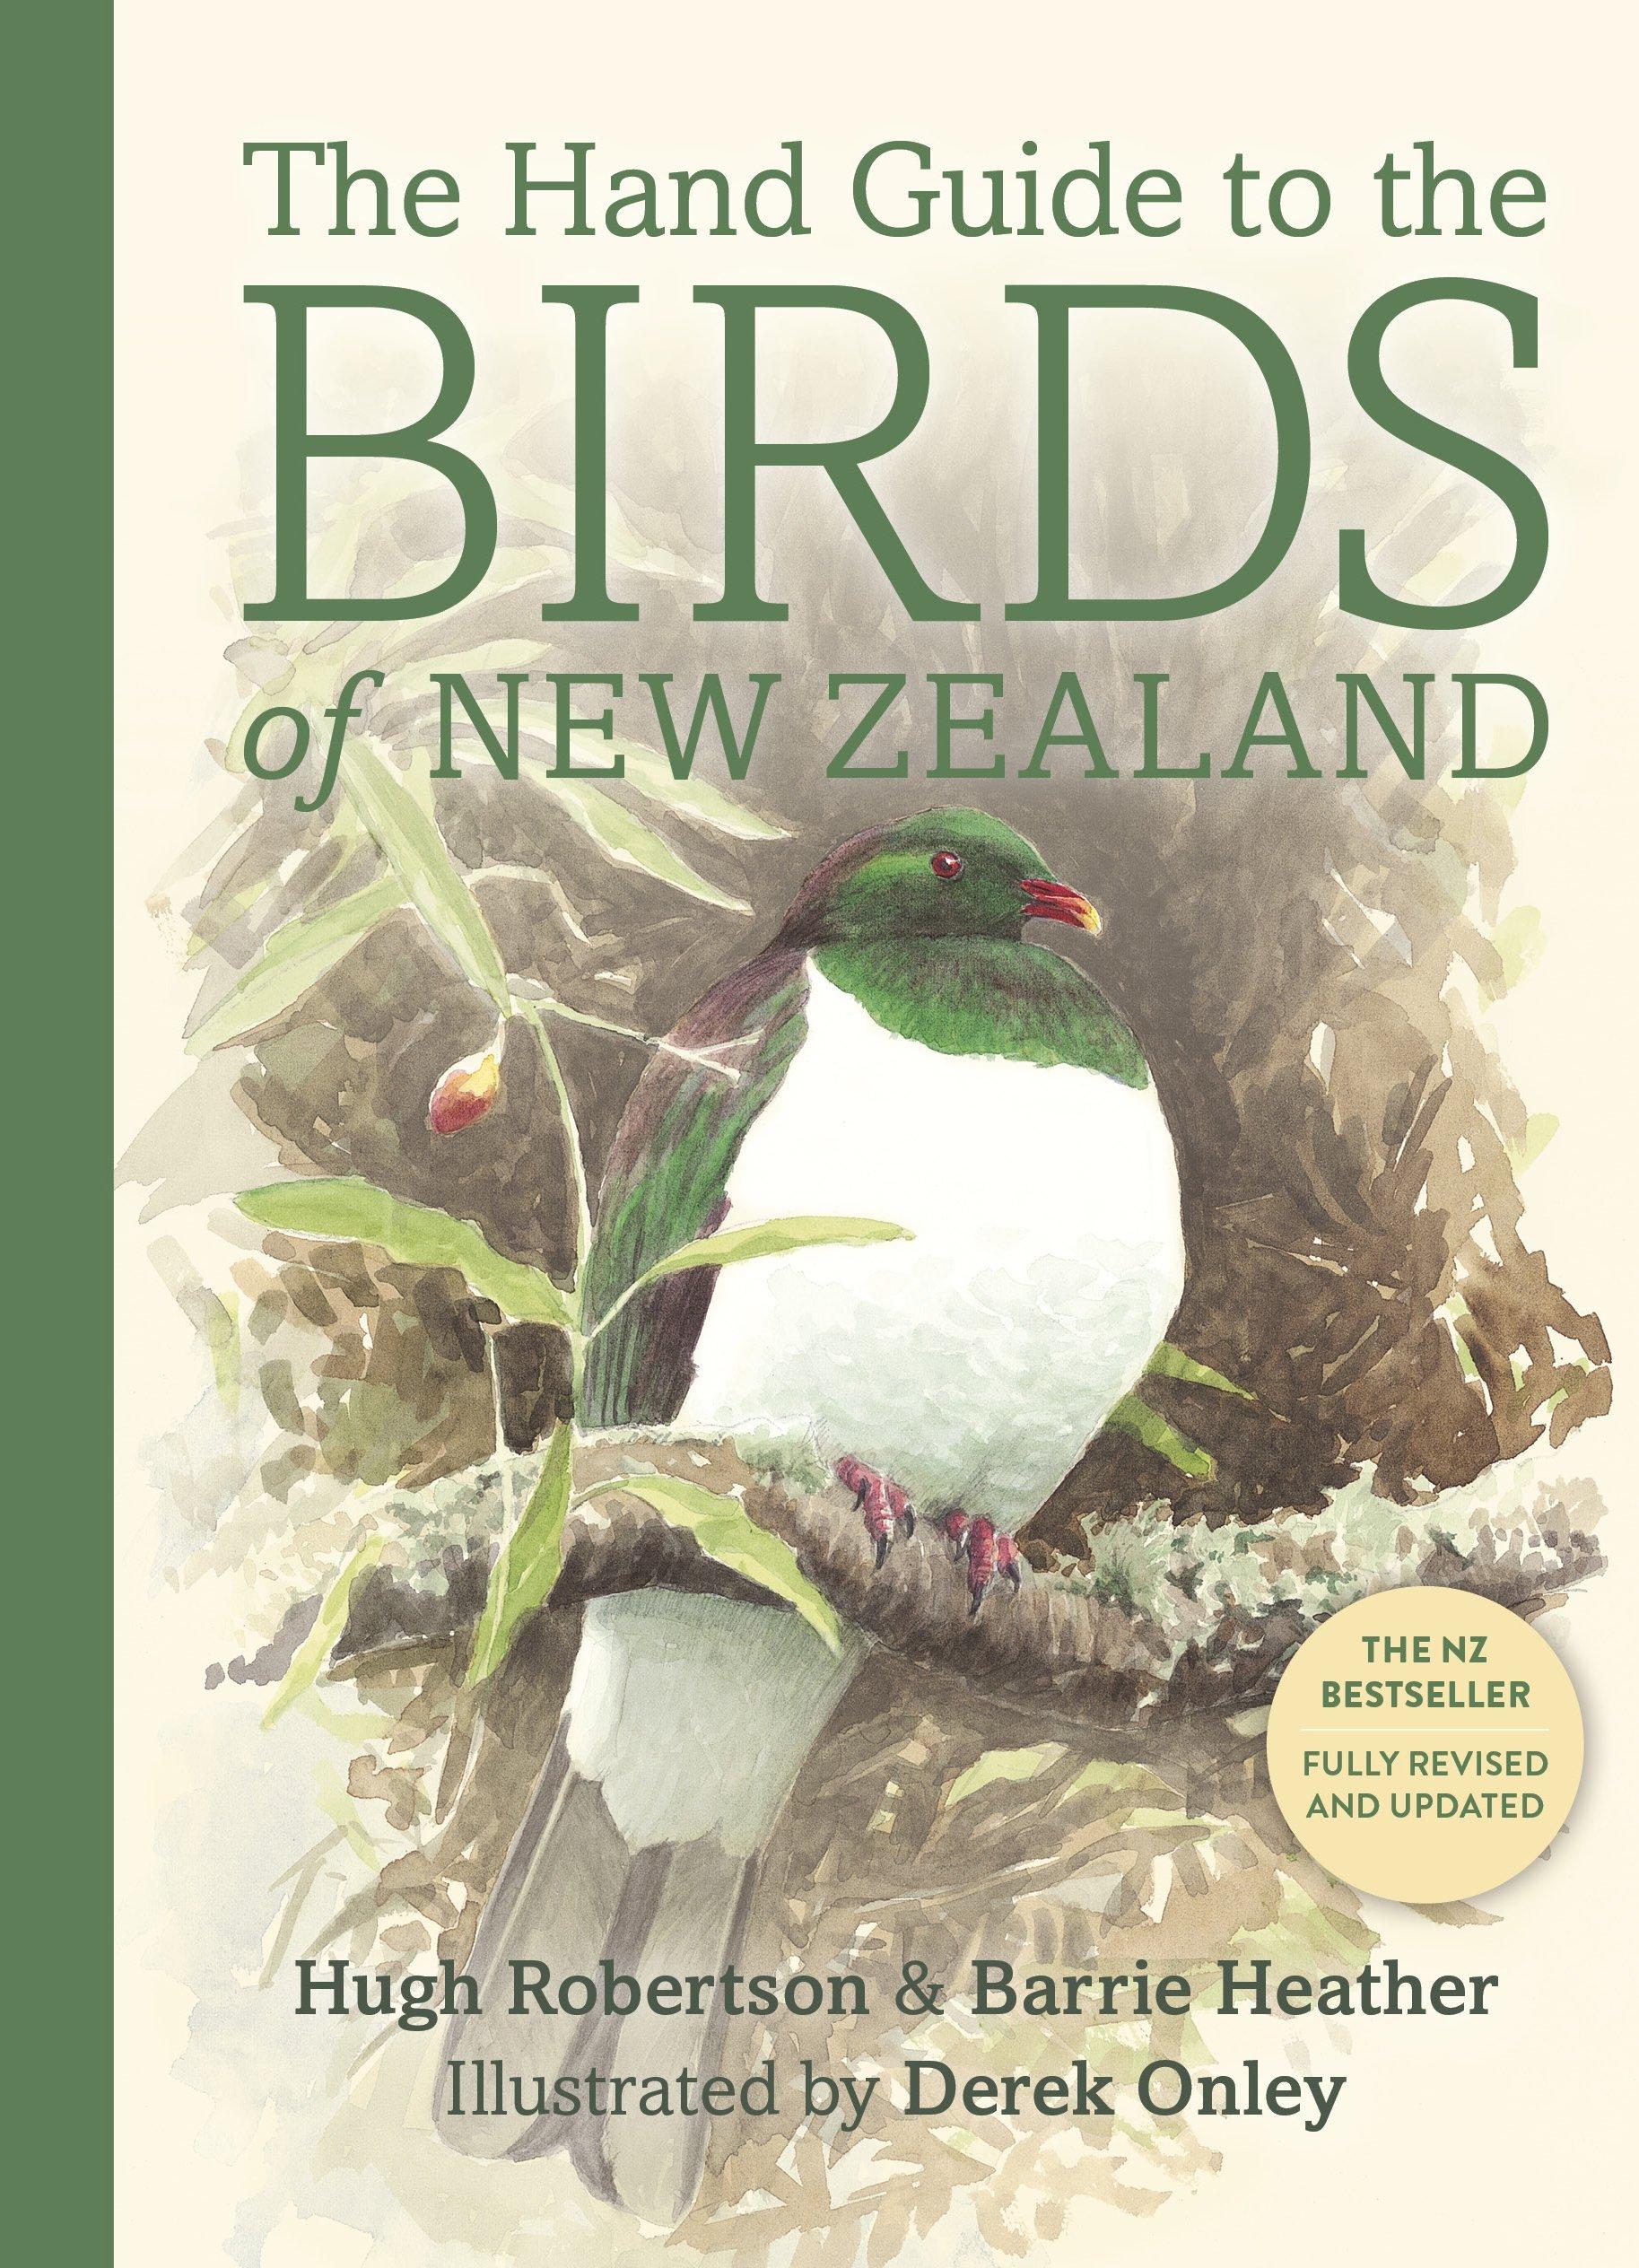 The Hand Guide to the Birds of New Zealand: Hugh Robertson, Barrie Heather,  Derek Onley: 9780143570936: Amazon.com: Books